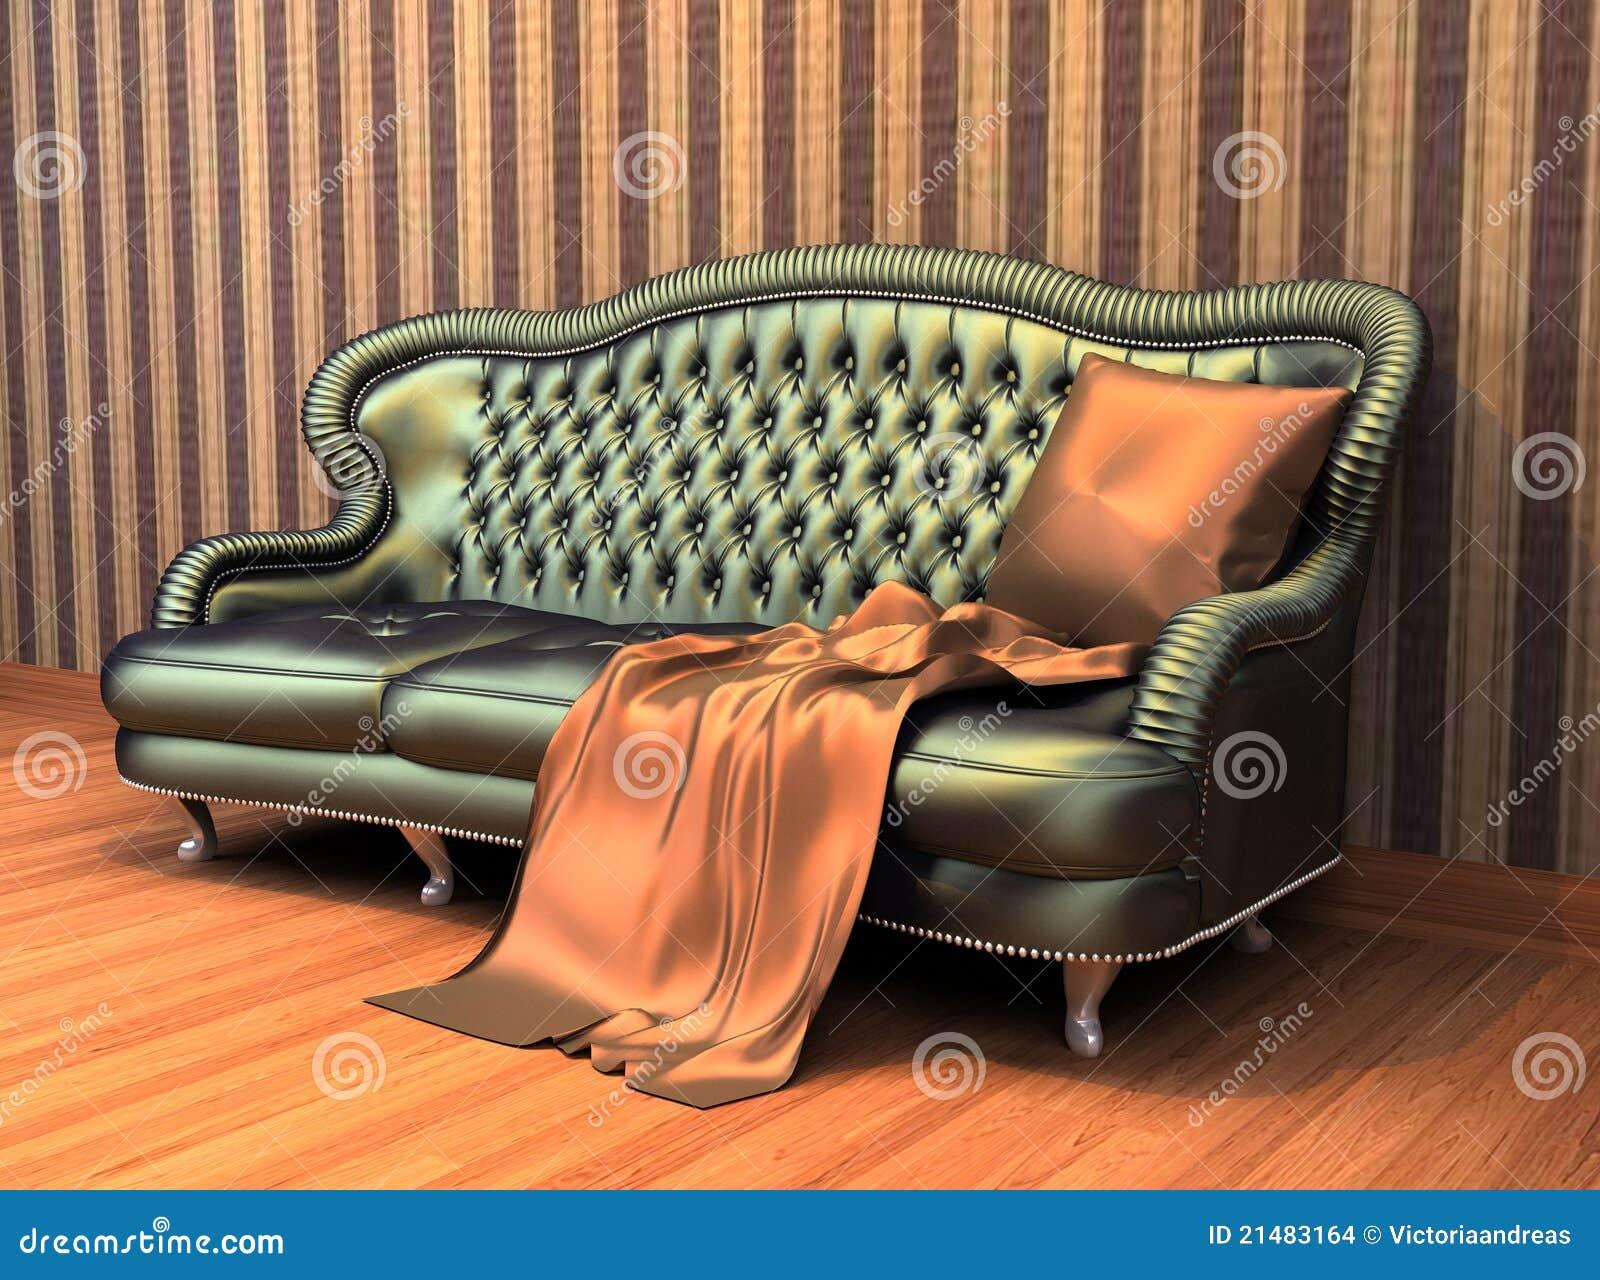 bettdecke kissen und stock illustrationen vektors klipart 289 stock illustrations. Black Bedroom Furniture Sets. Home Design Ideas